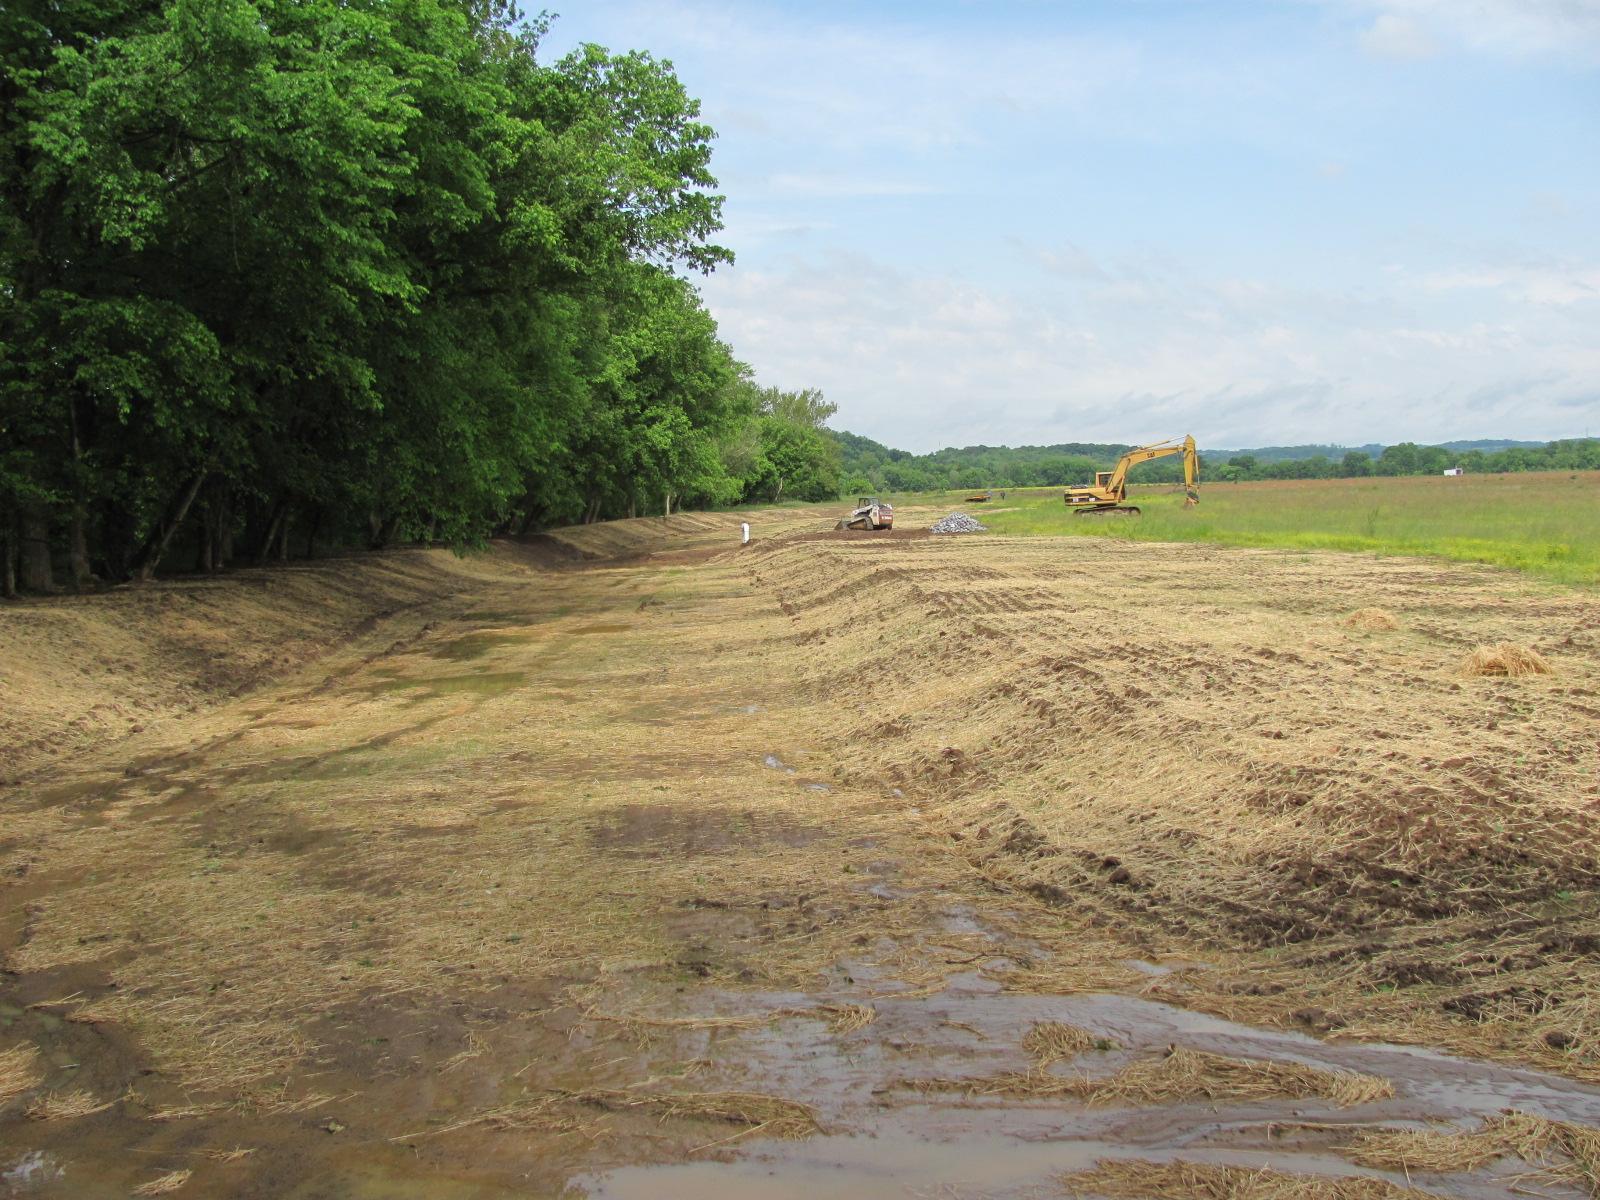 Shelton Tomato Farms Sediment Management Project, Sediment Basin, Hamblen County, TN